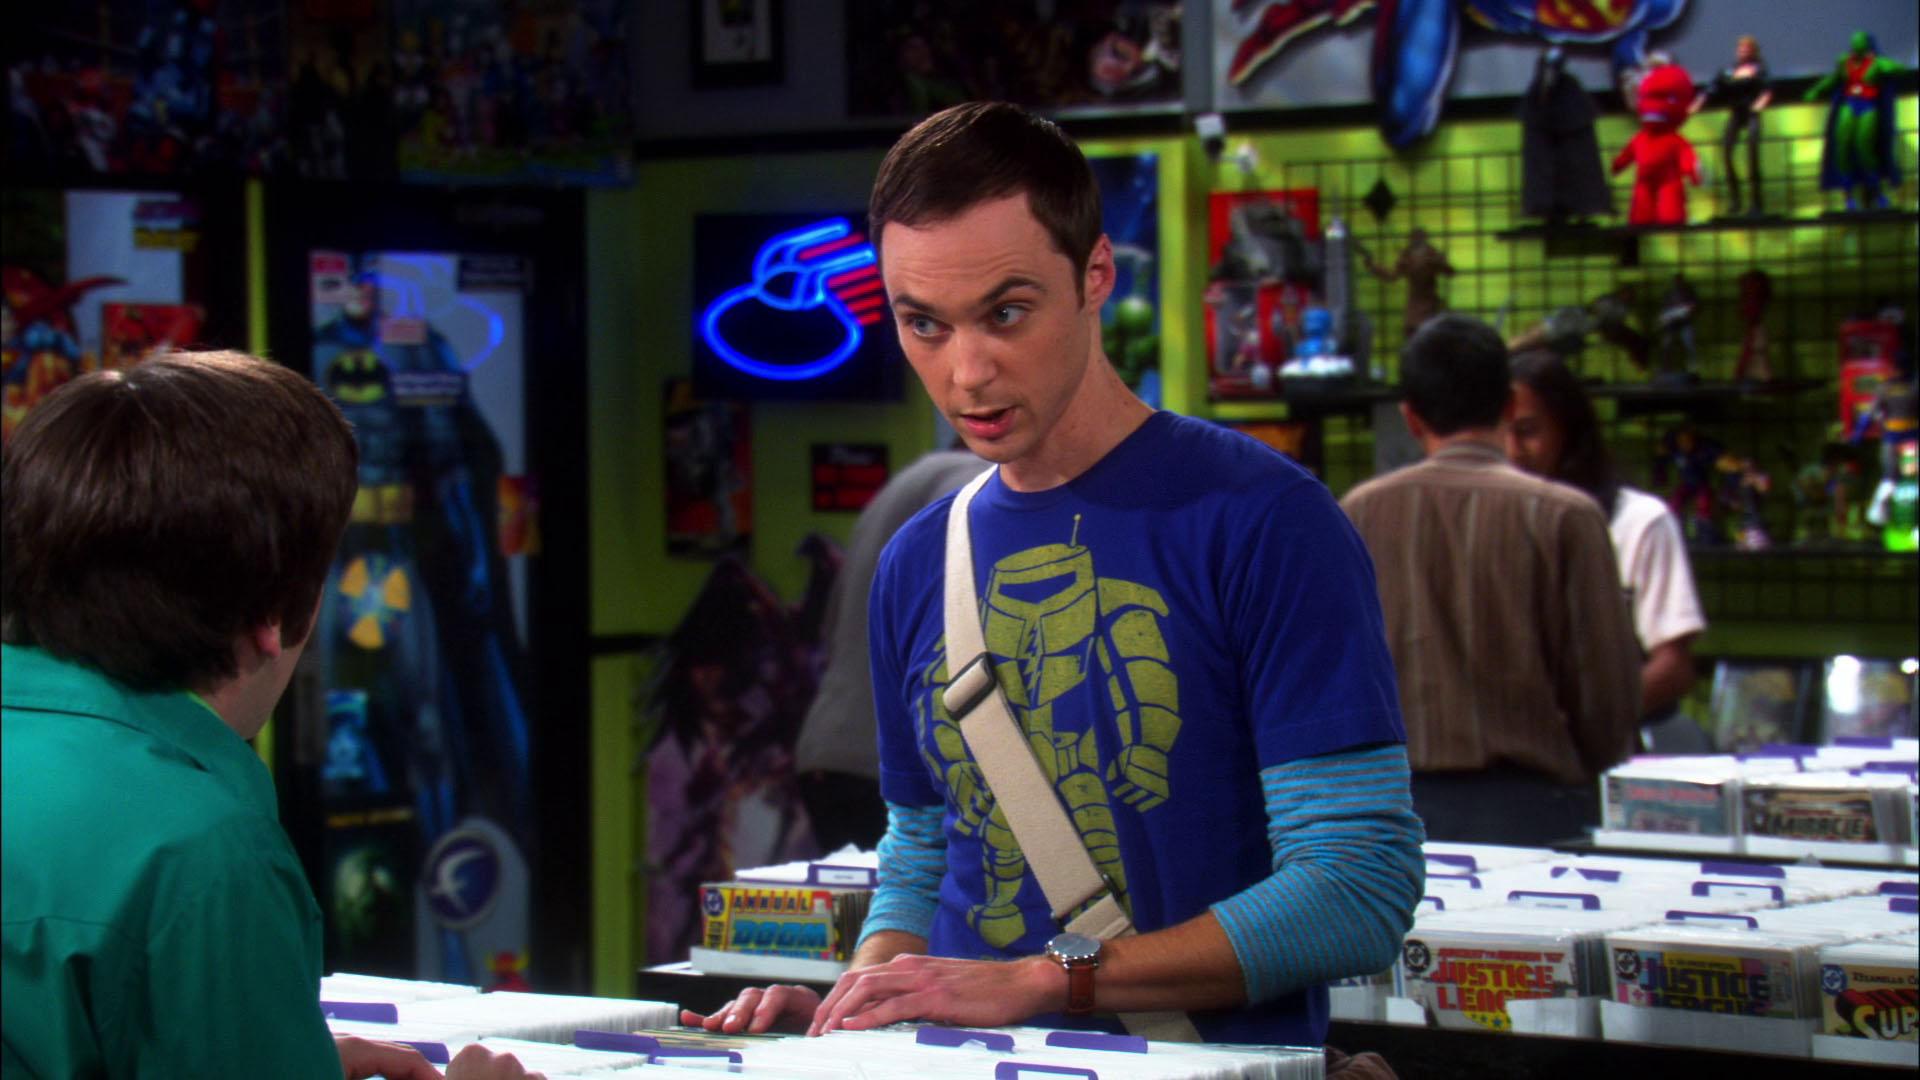 Sheldon-comic-book-store